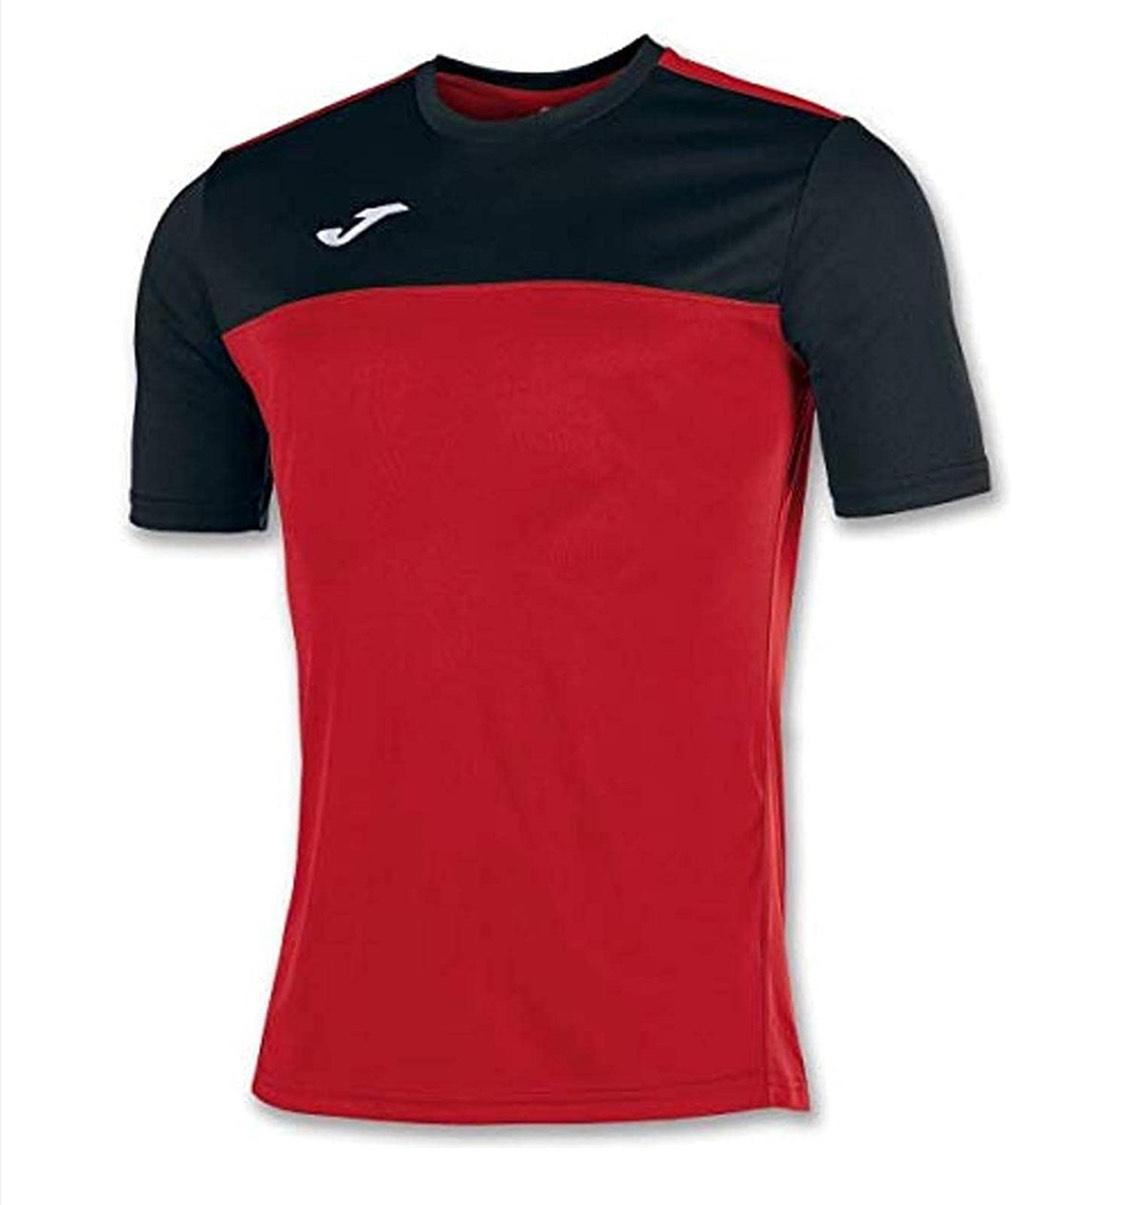 Camiseta deportiva Joma adulto talla M.